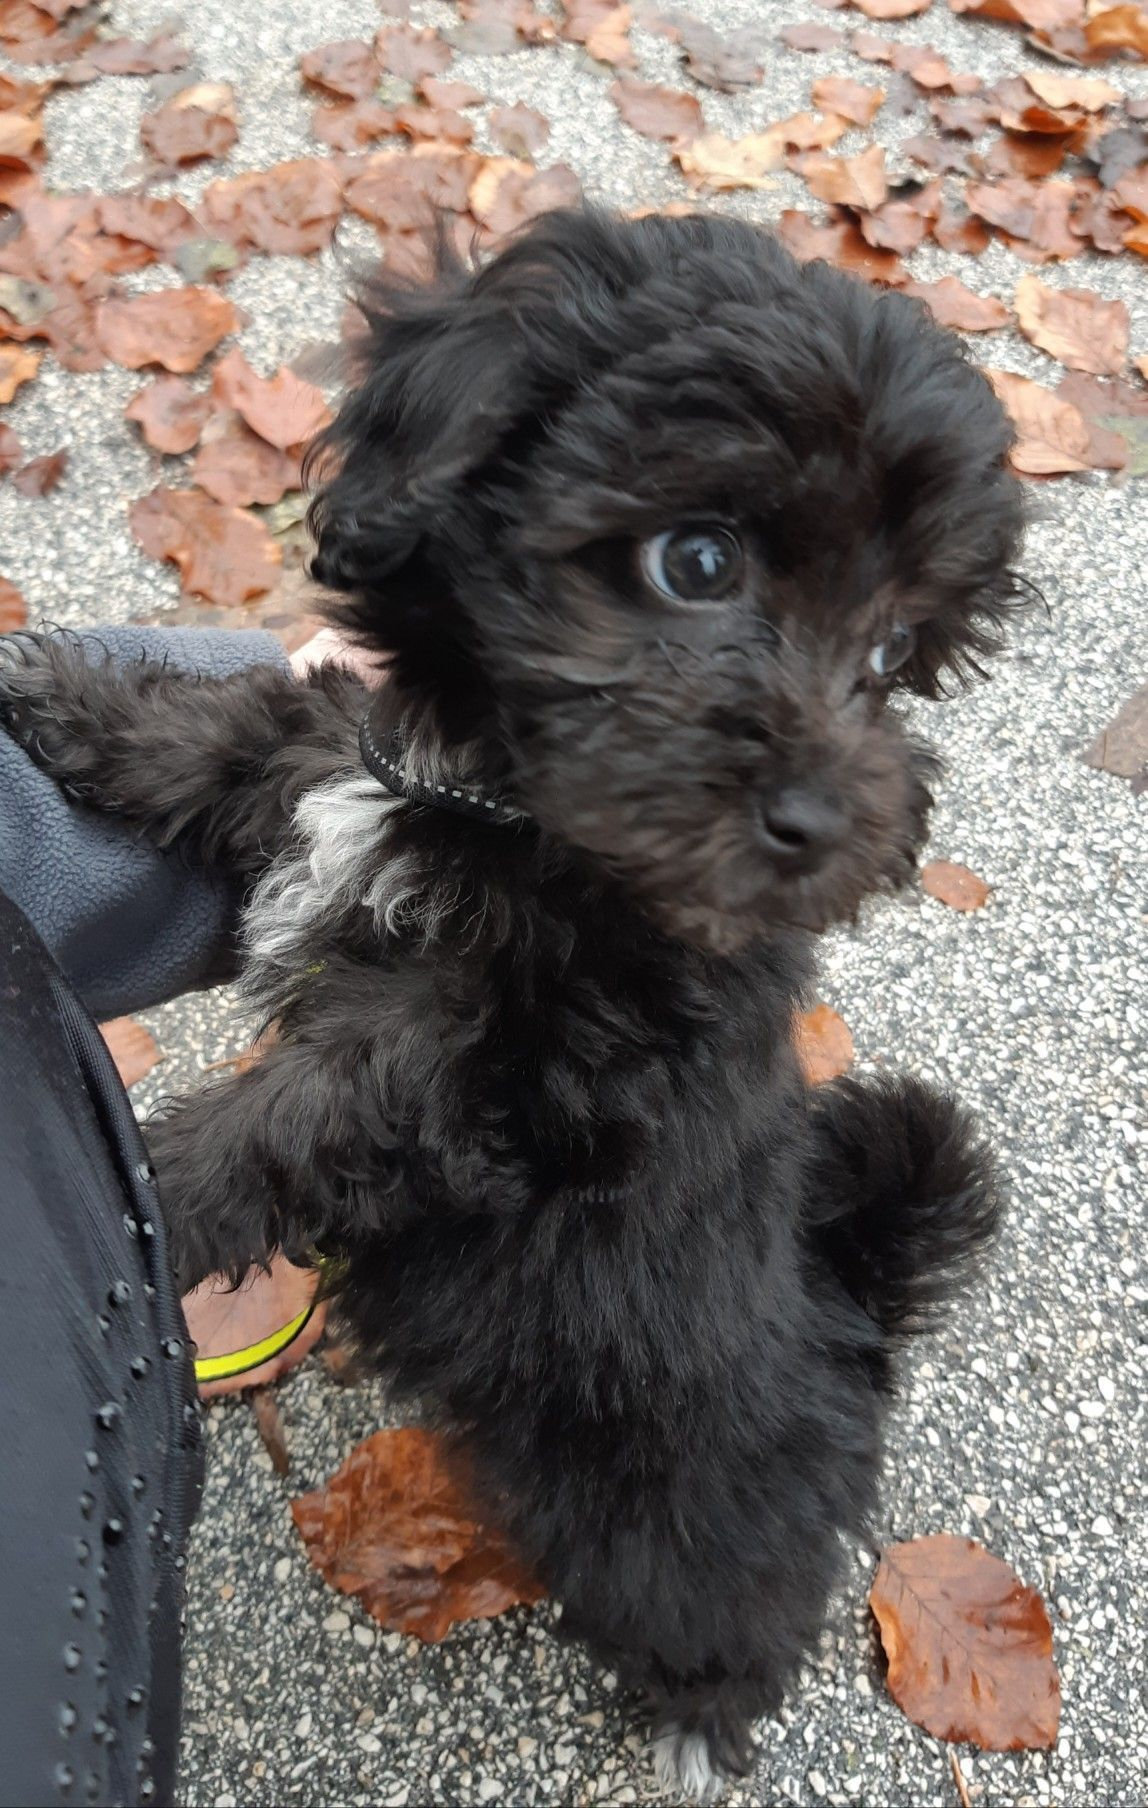 Maltipoo Puppy Teacup Dogs Black Tiny Little Hybrid Pet